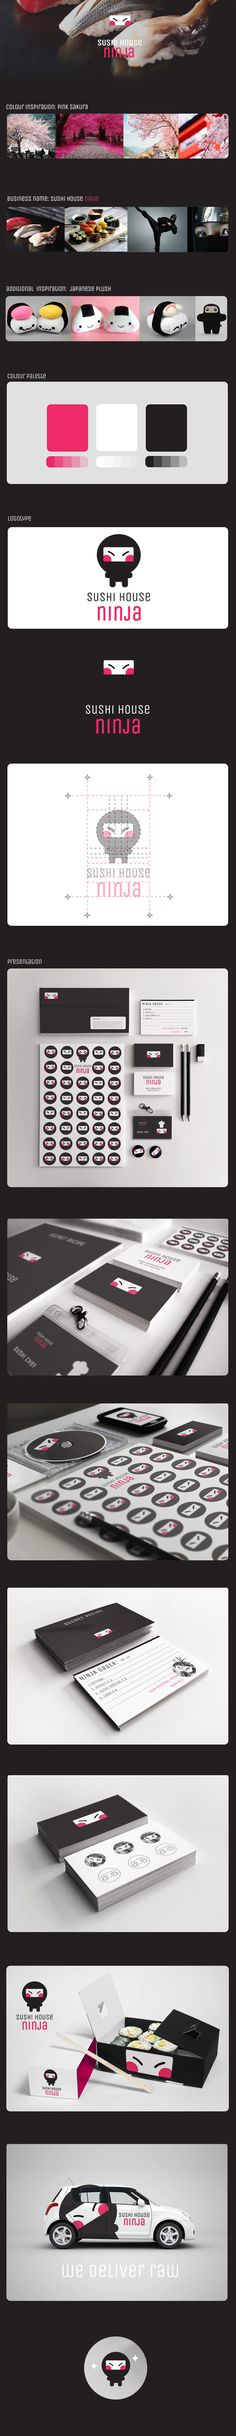 Sushi House Ninja by Cosa Nostra, via Behance #identity #packaging #branding #marketing PD